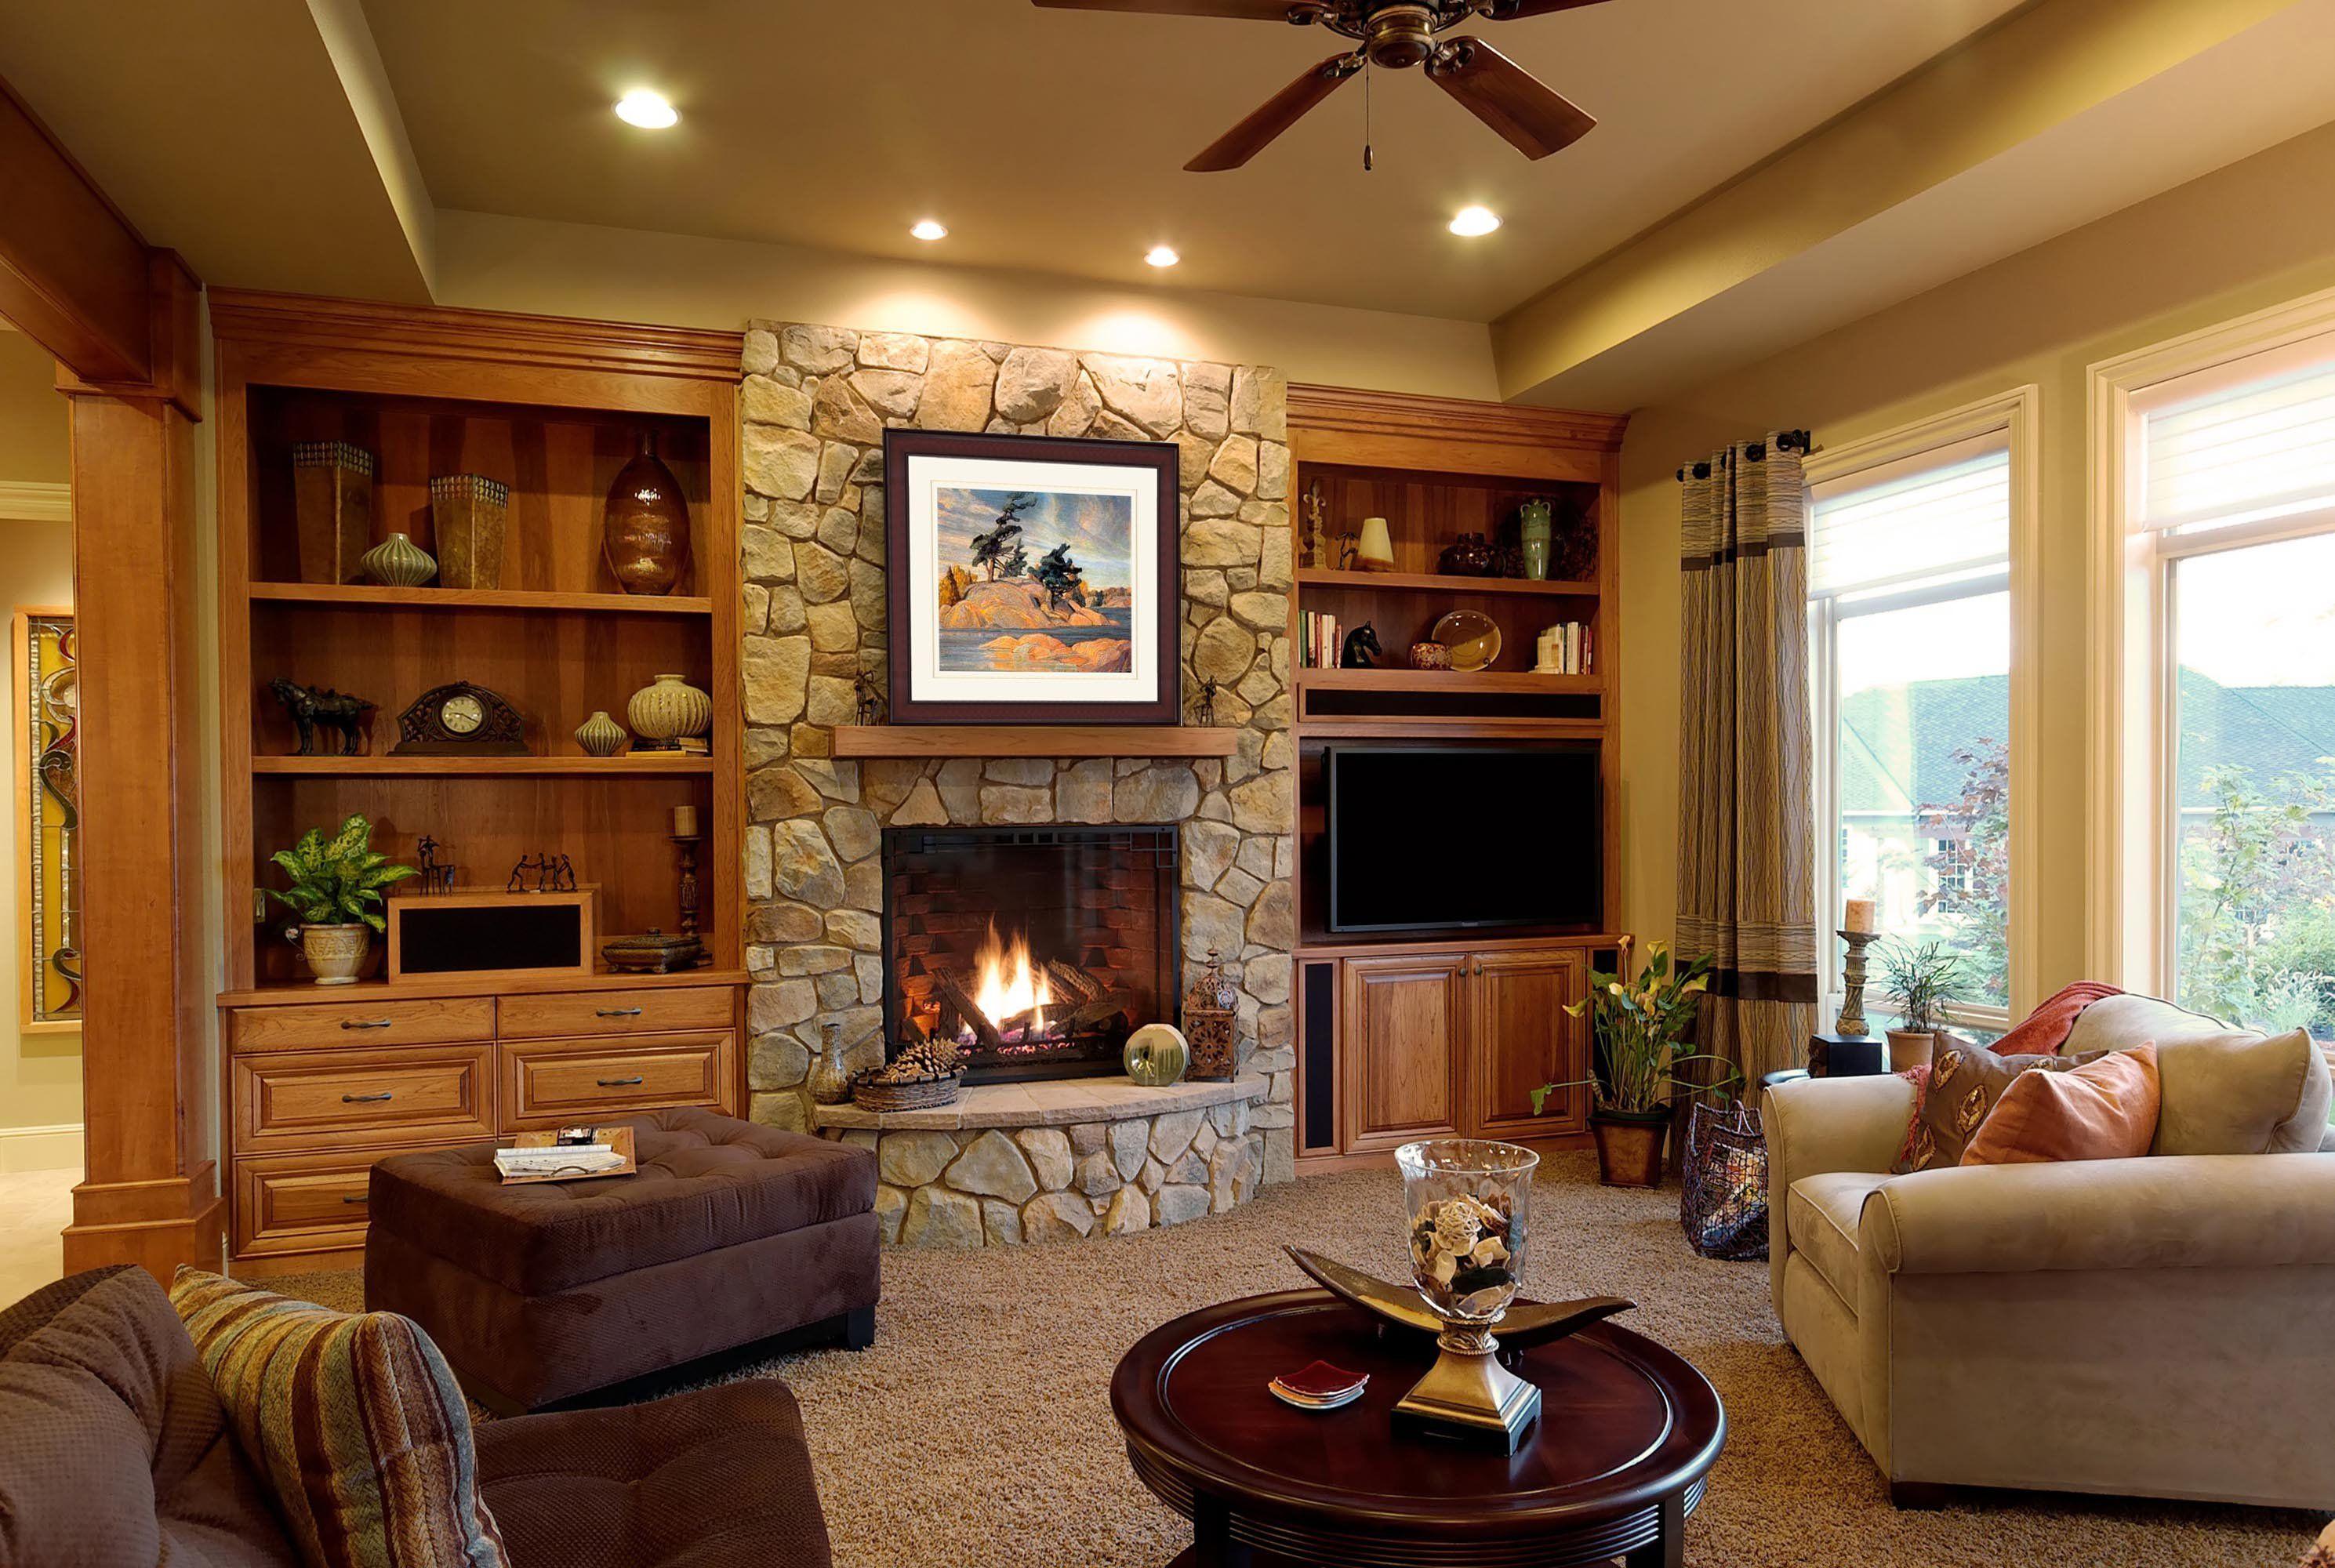 Cozy Living Room Decorating Ideas Elegant Cozy Living Room Ideas Home Ideas Blog Cozy Living Room Design Living Room Warm Cozy Living Rooms #warm #cozy #living #room #colors